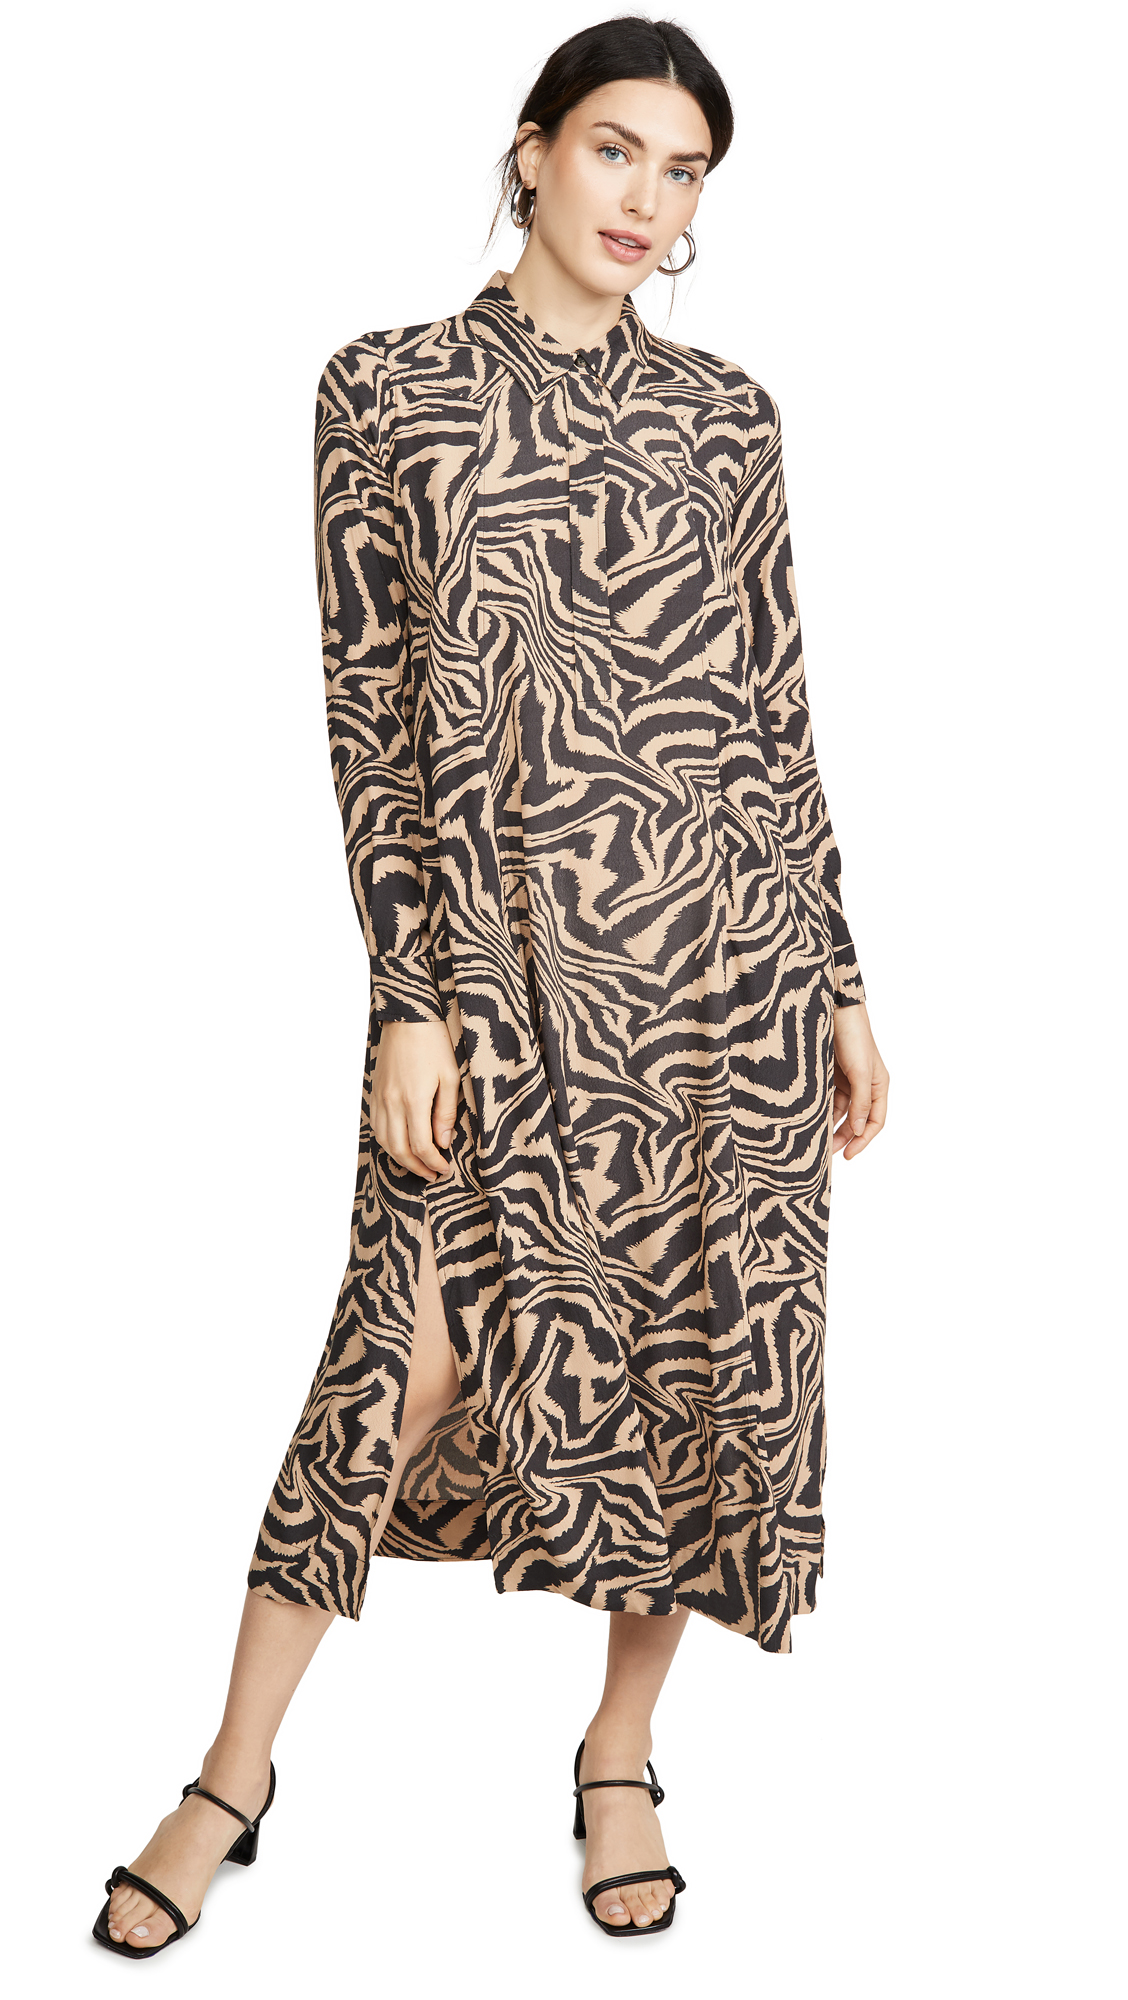 GANNI Printed Crepe Dress - 55% Off Sale